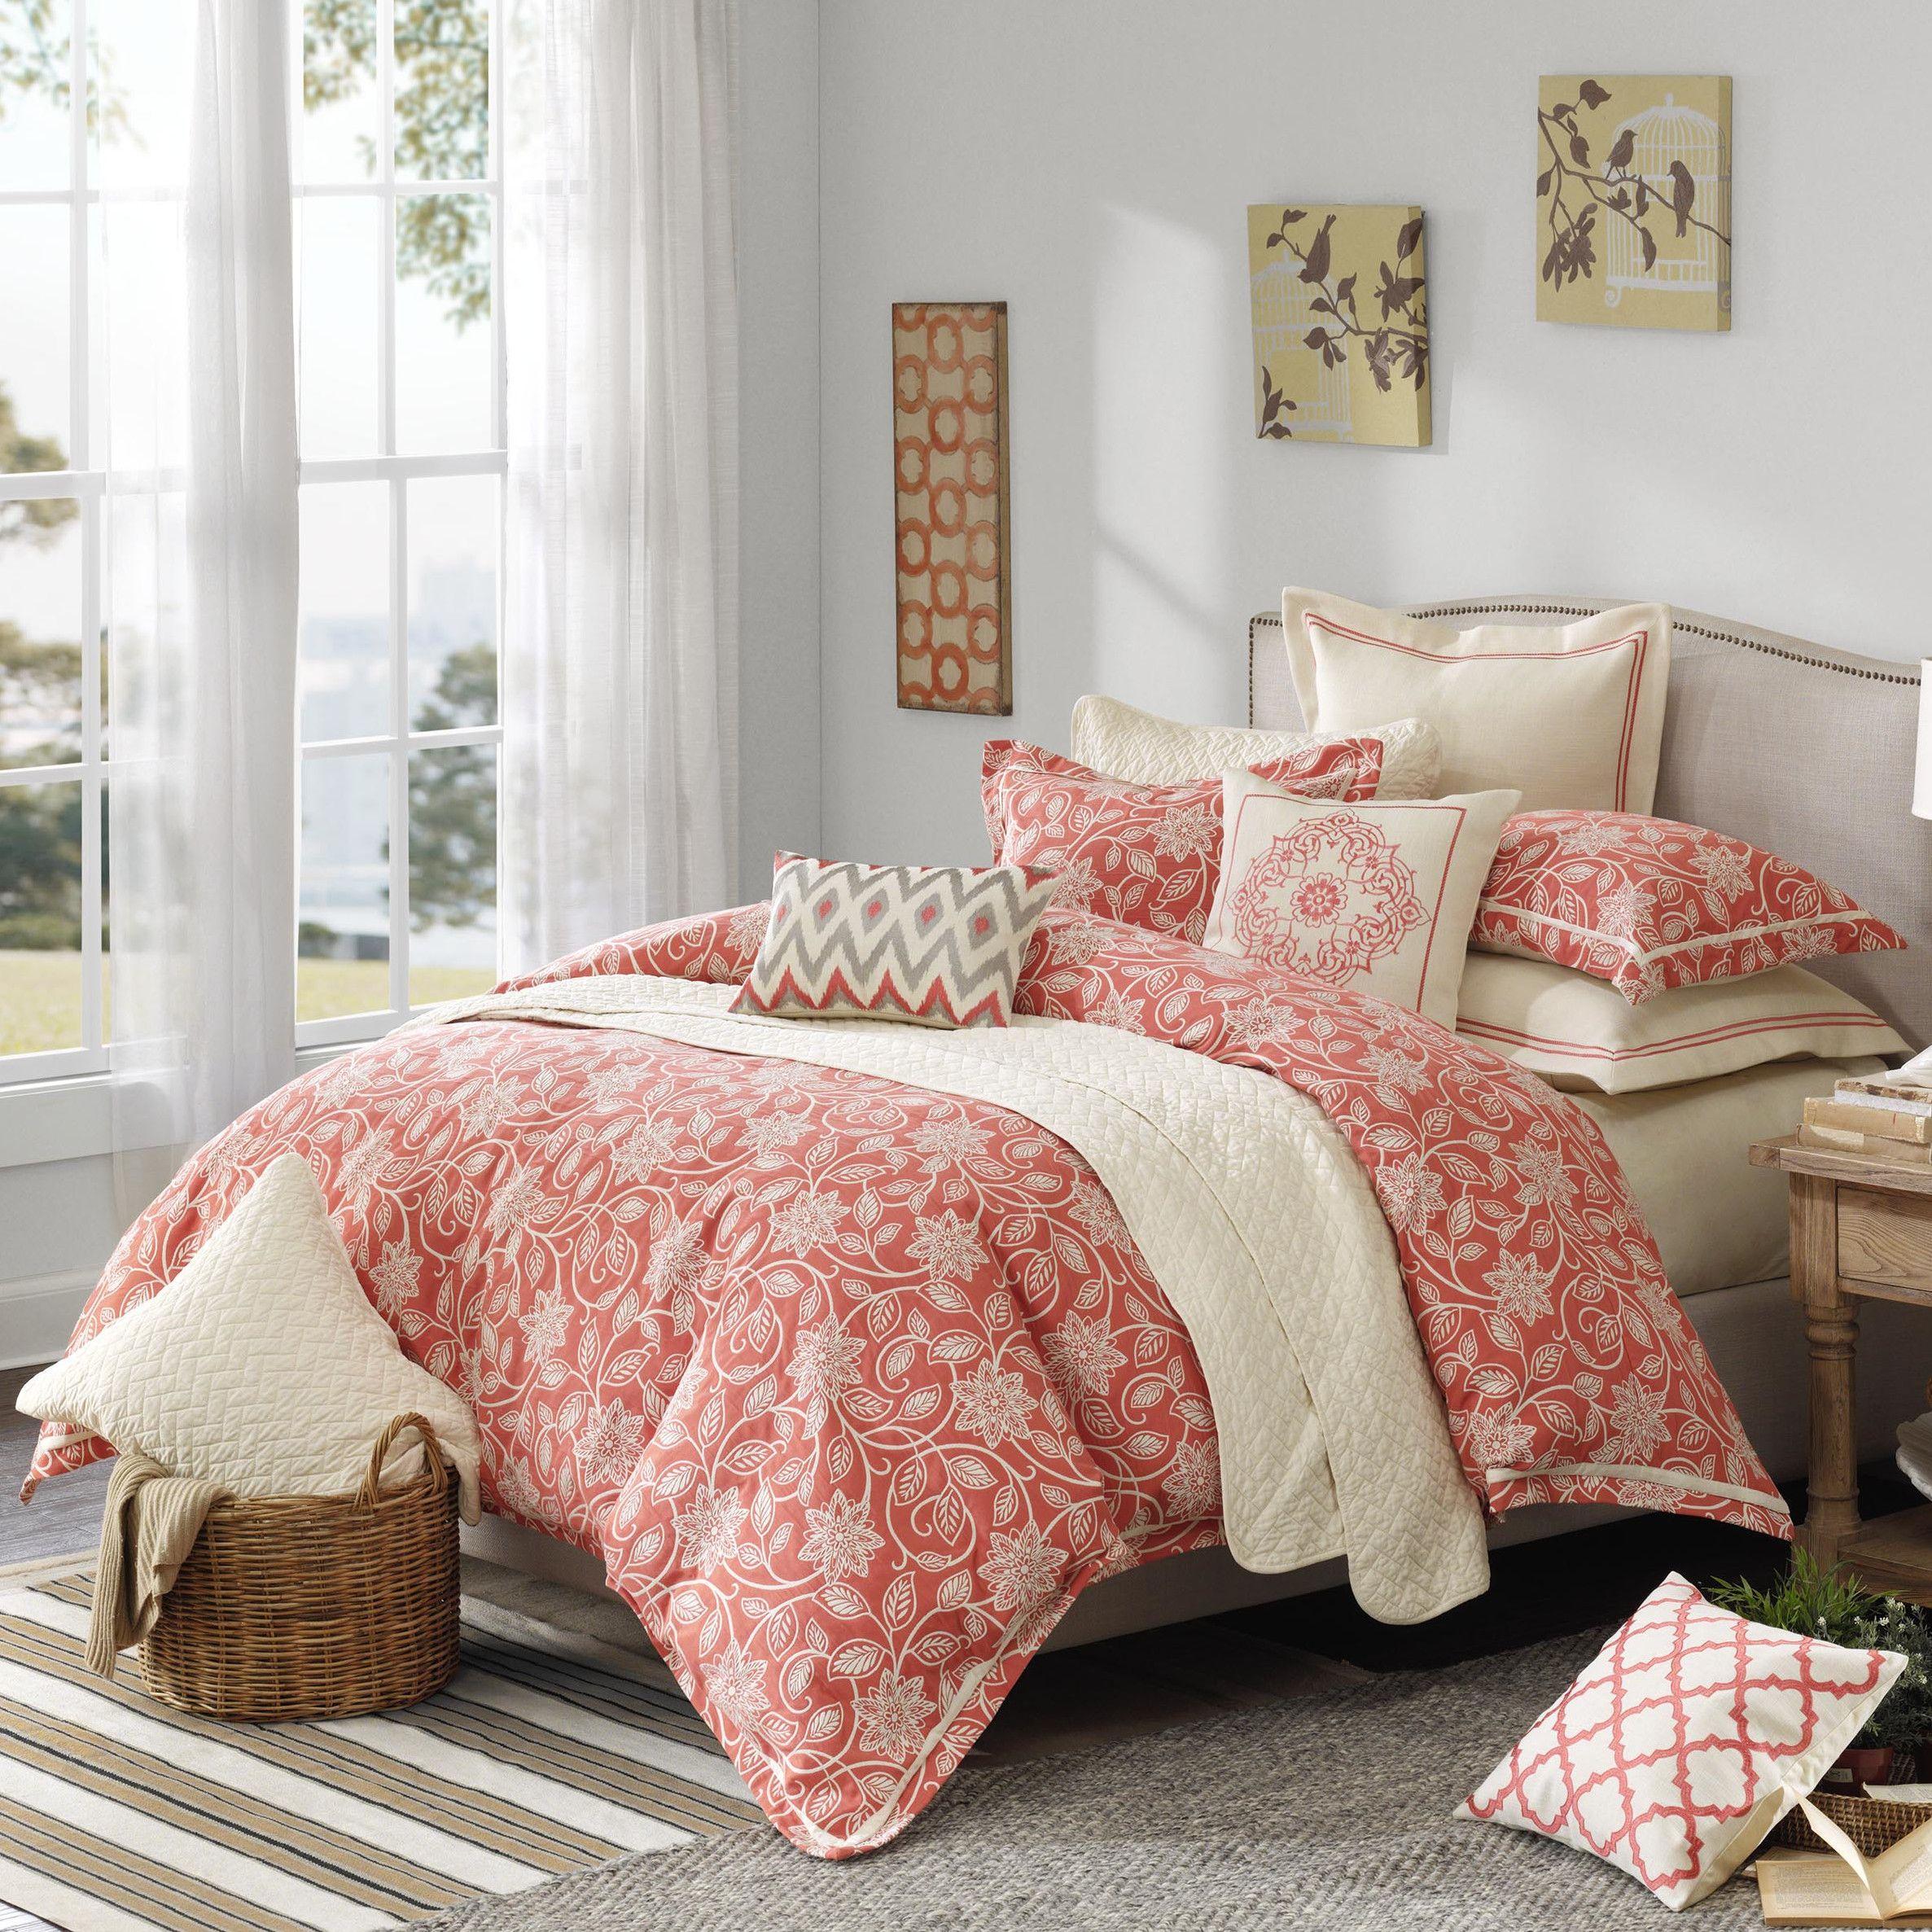 pin room with pillow vintage bergamot bedding dec furnished robshaw madura john duvet neela bed